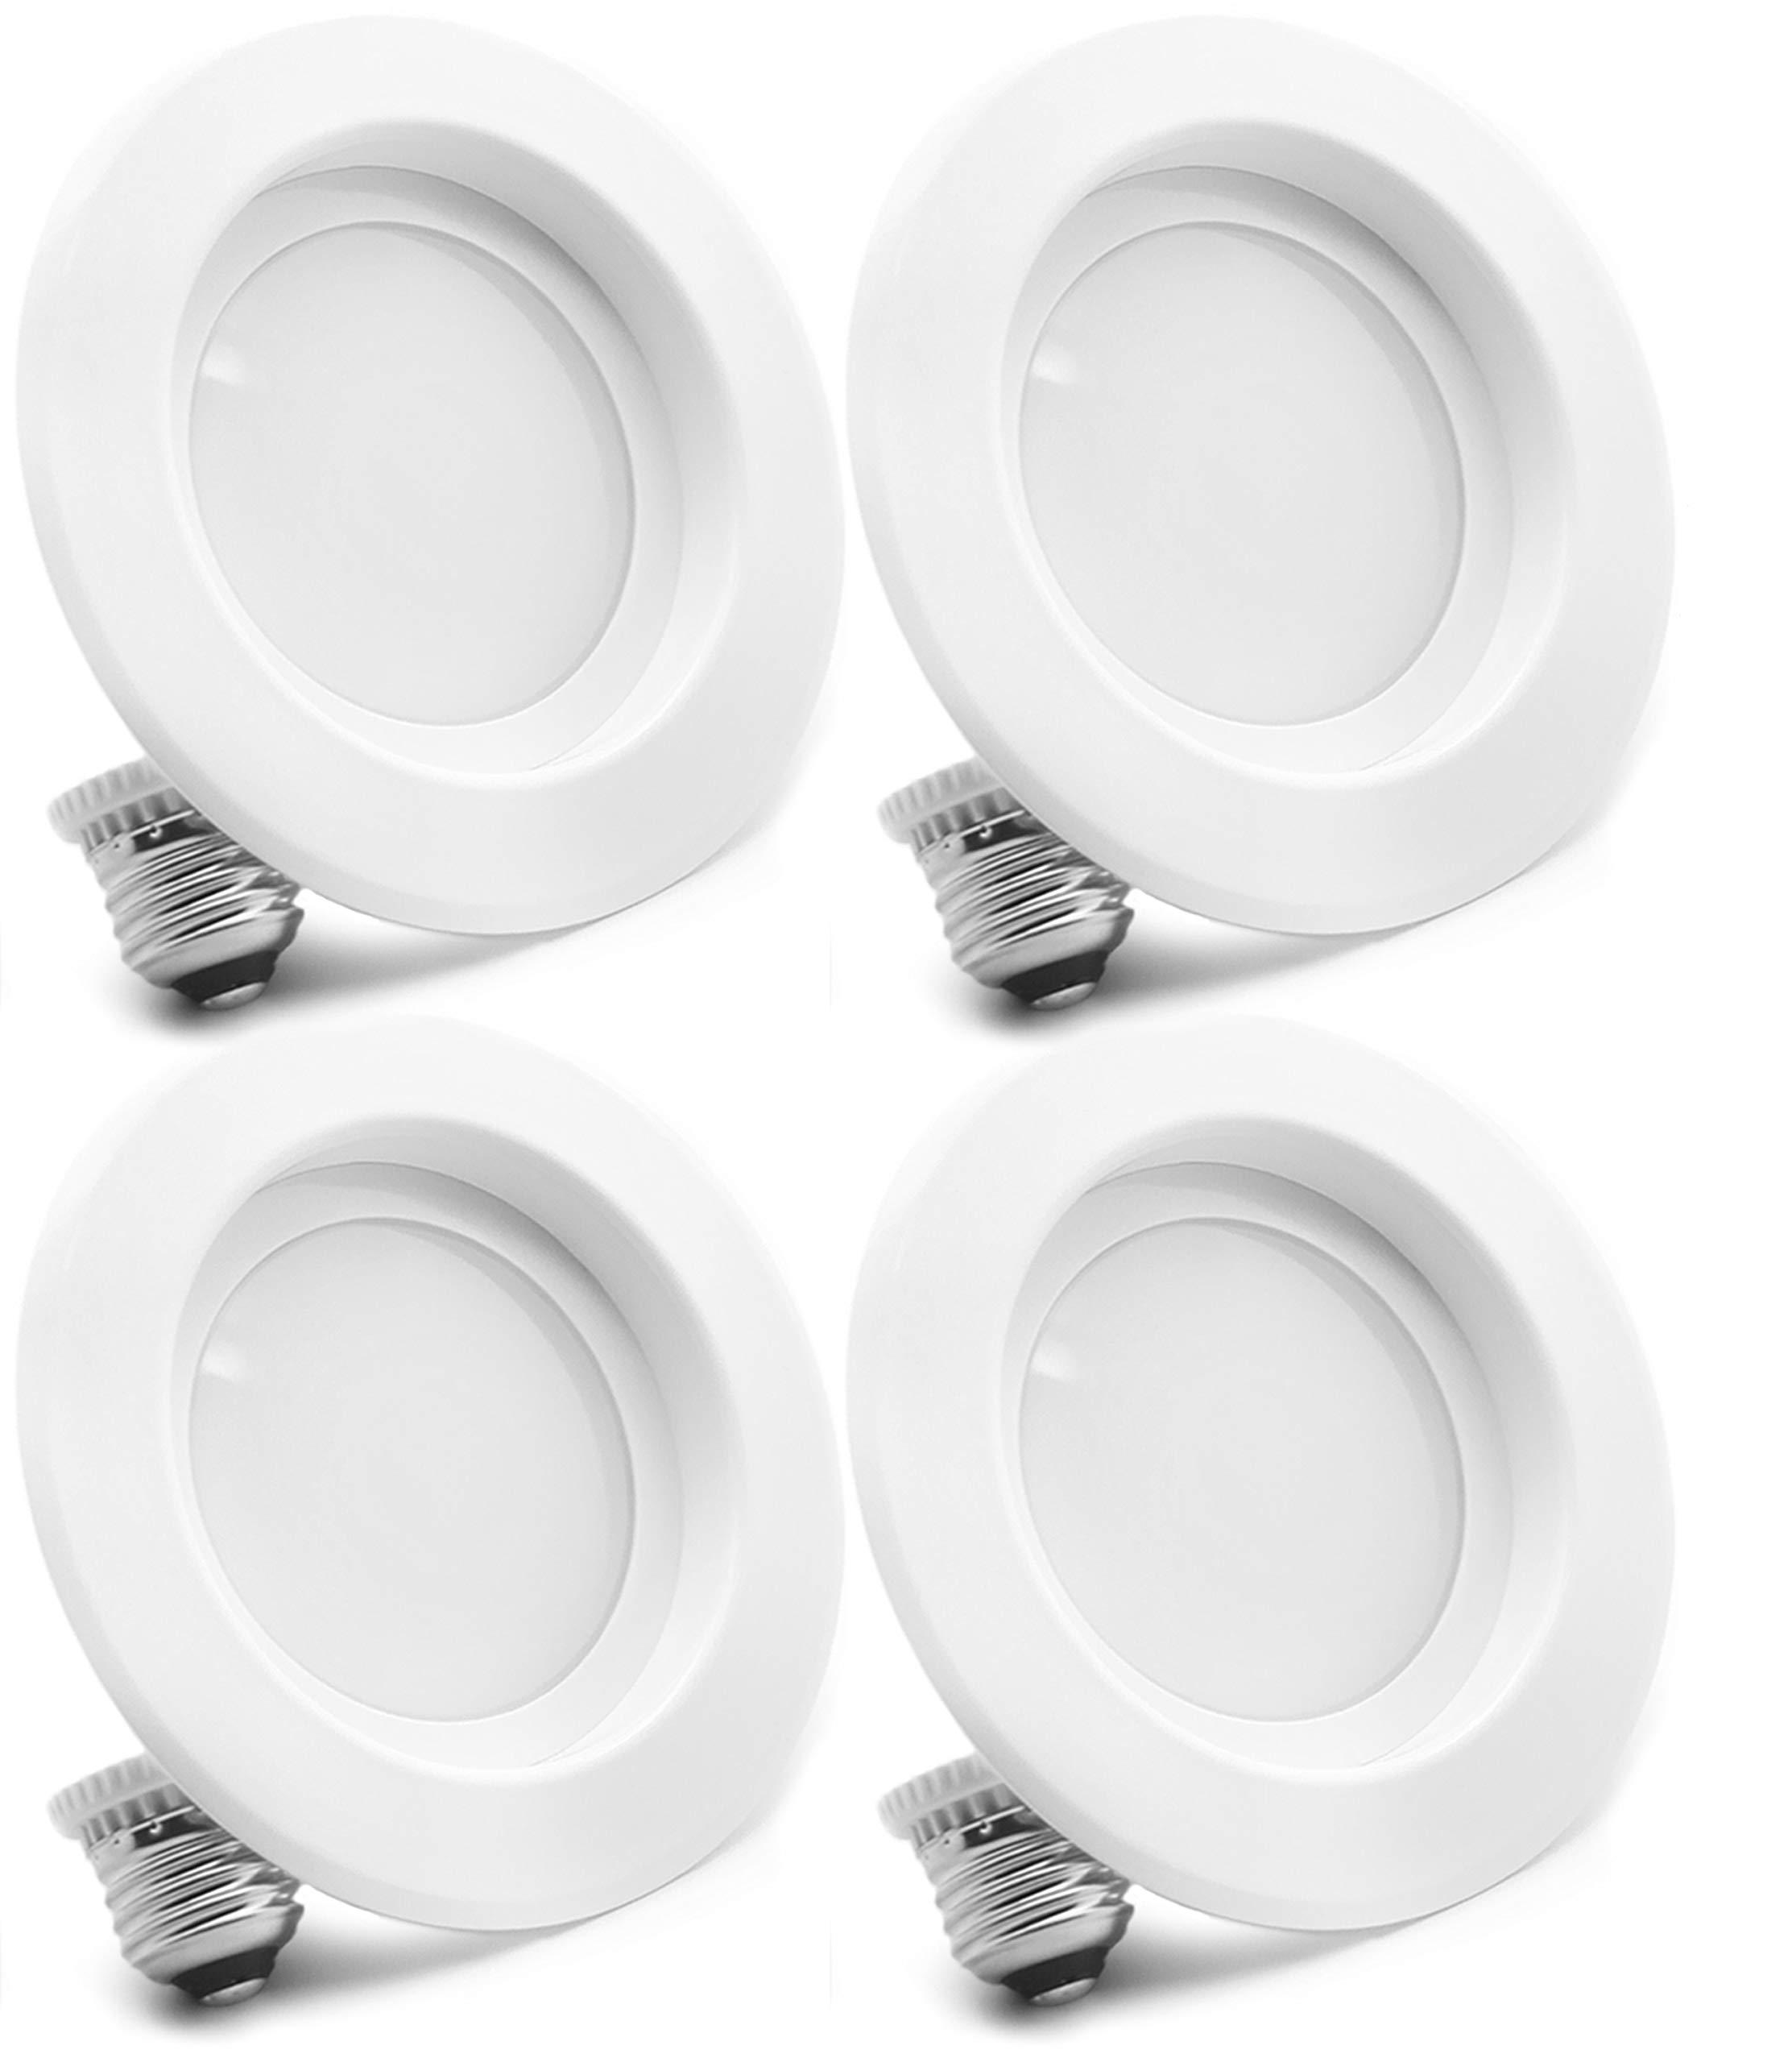 4 Pack Bioluz LED 4-inch 13 Watt 90 CRI Dimmable LED Retrofit Recessed Lighting Fixture - 2700K LED Ceiling Light - 910 Lumen Recessed Downlight UL-listed JA8 CEC